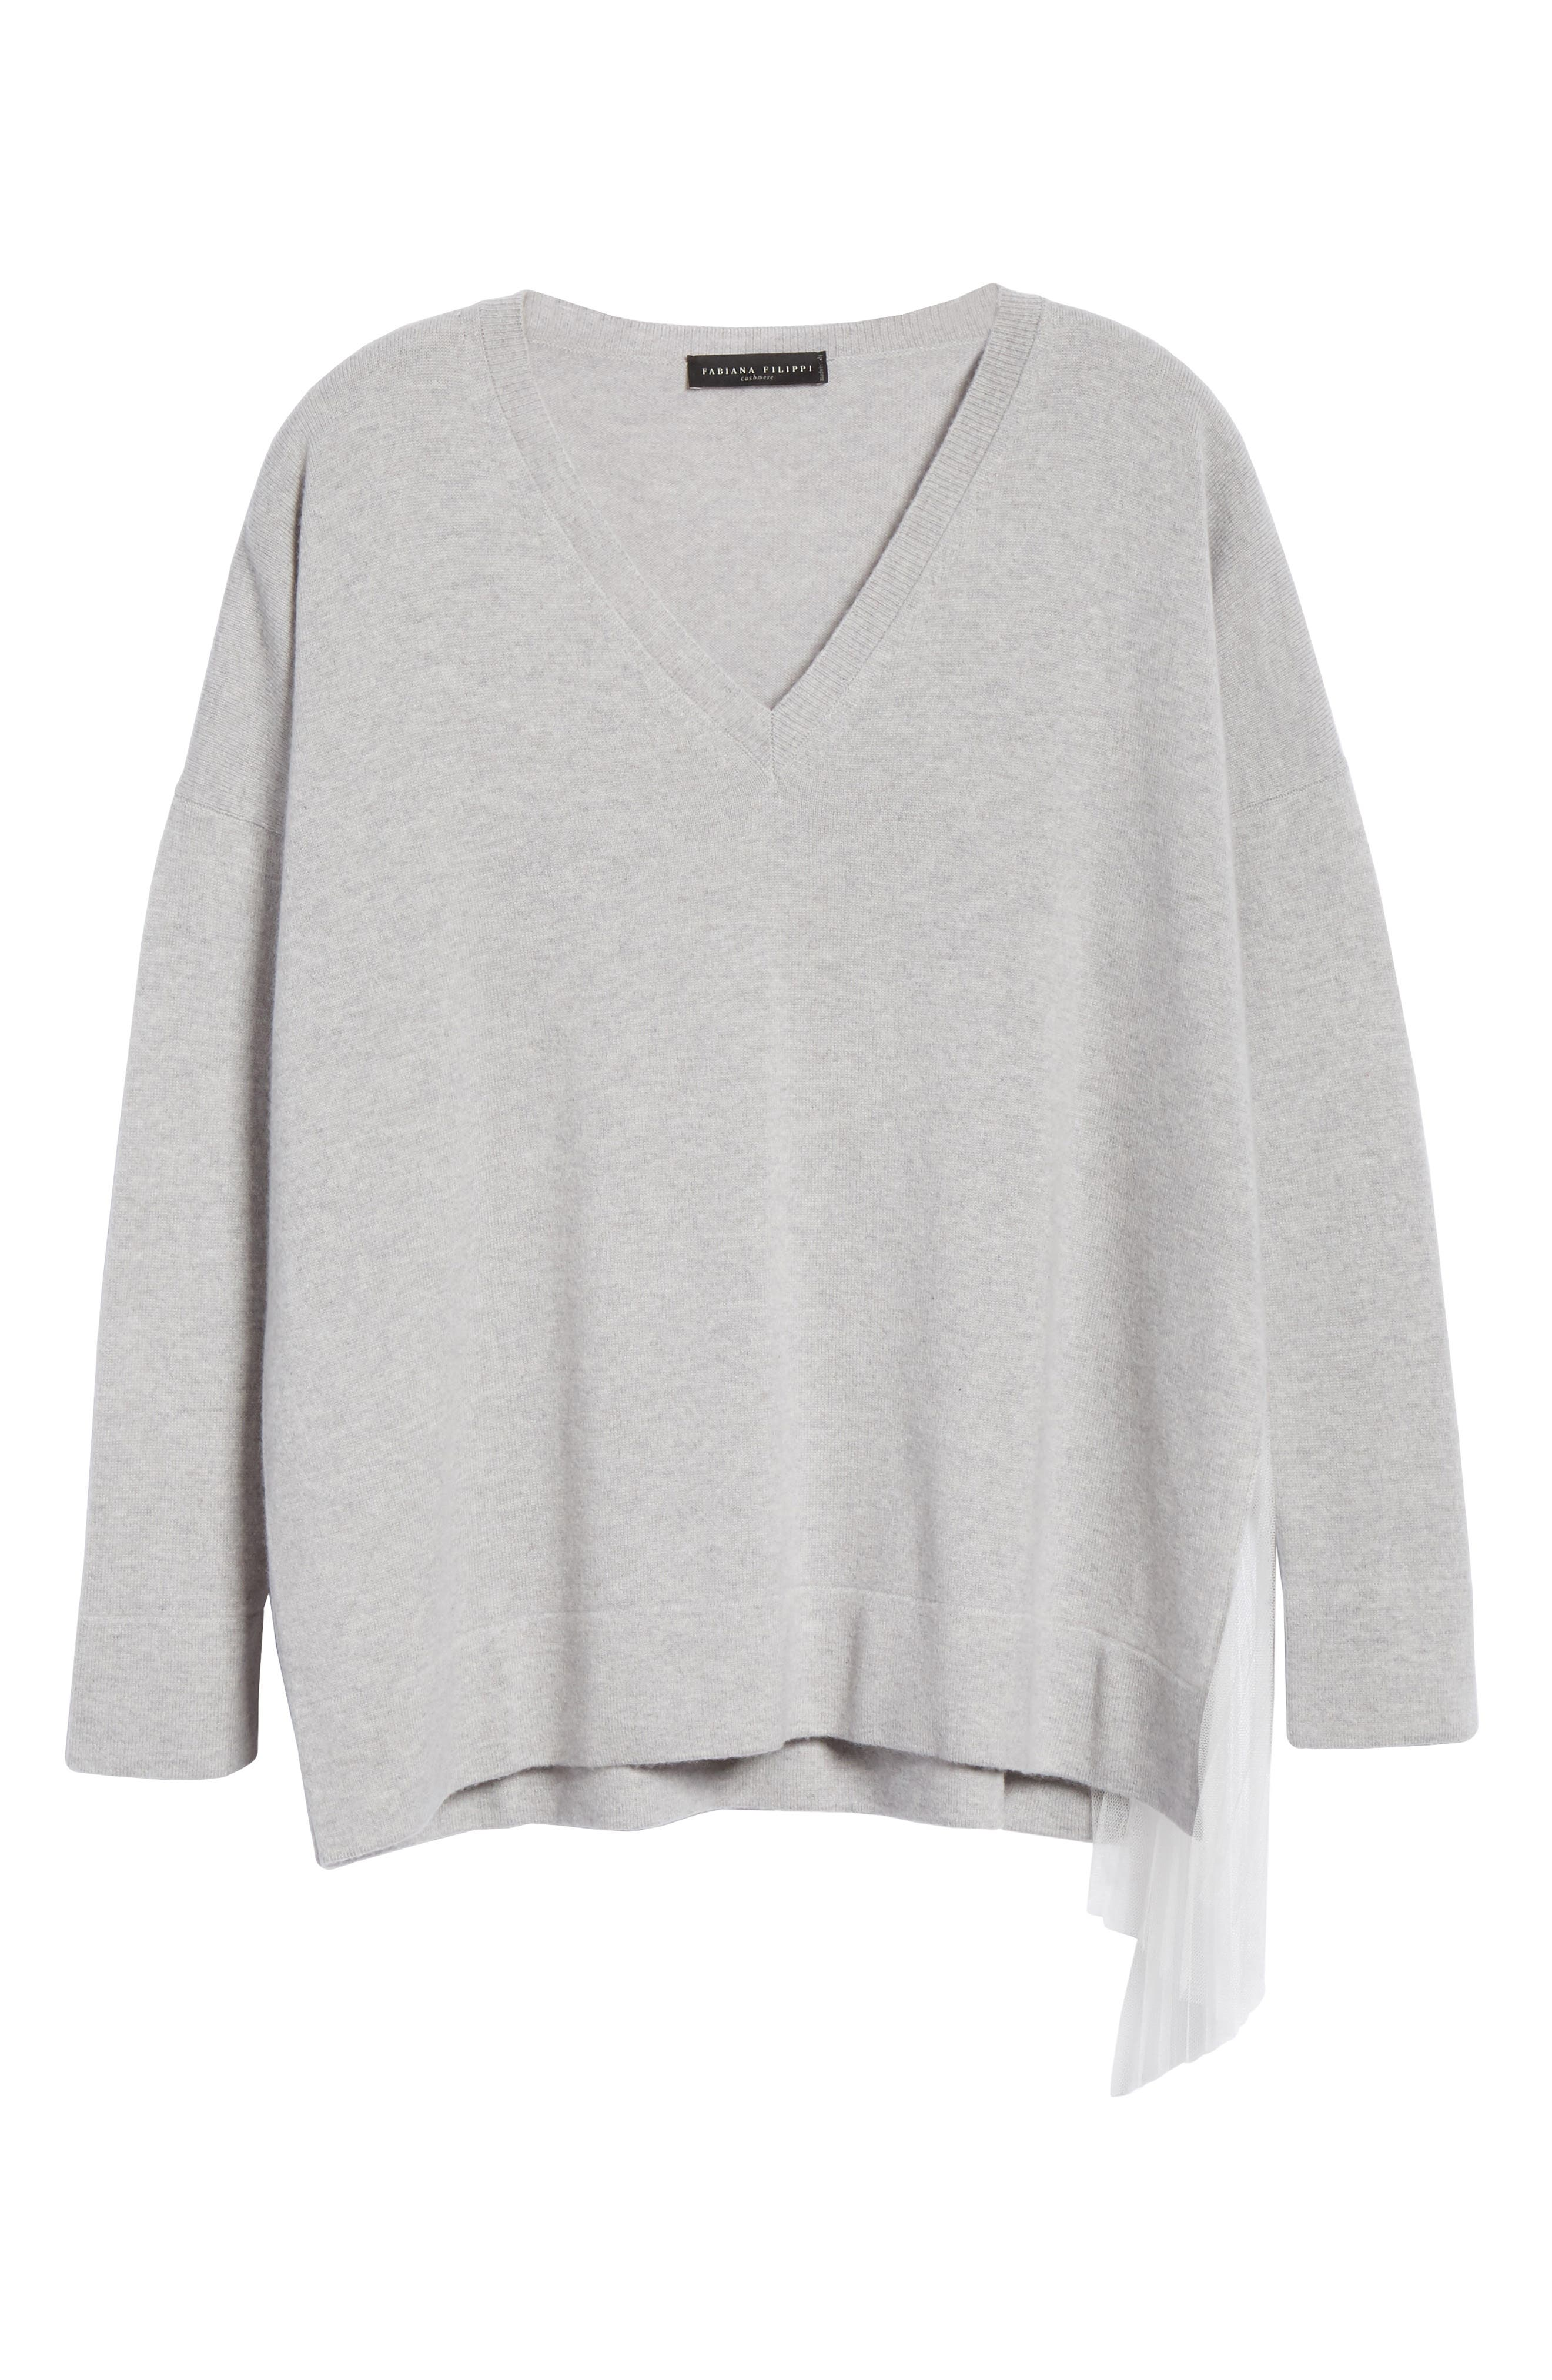 FABIANA FILIPPI,                             Tulle Inset Cashmere Sweater,                             Alternate thumbnail 7, color,                             GREY